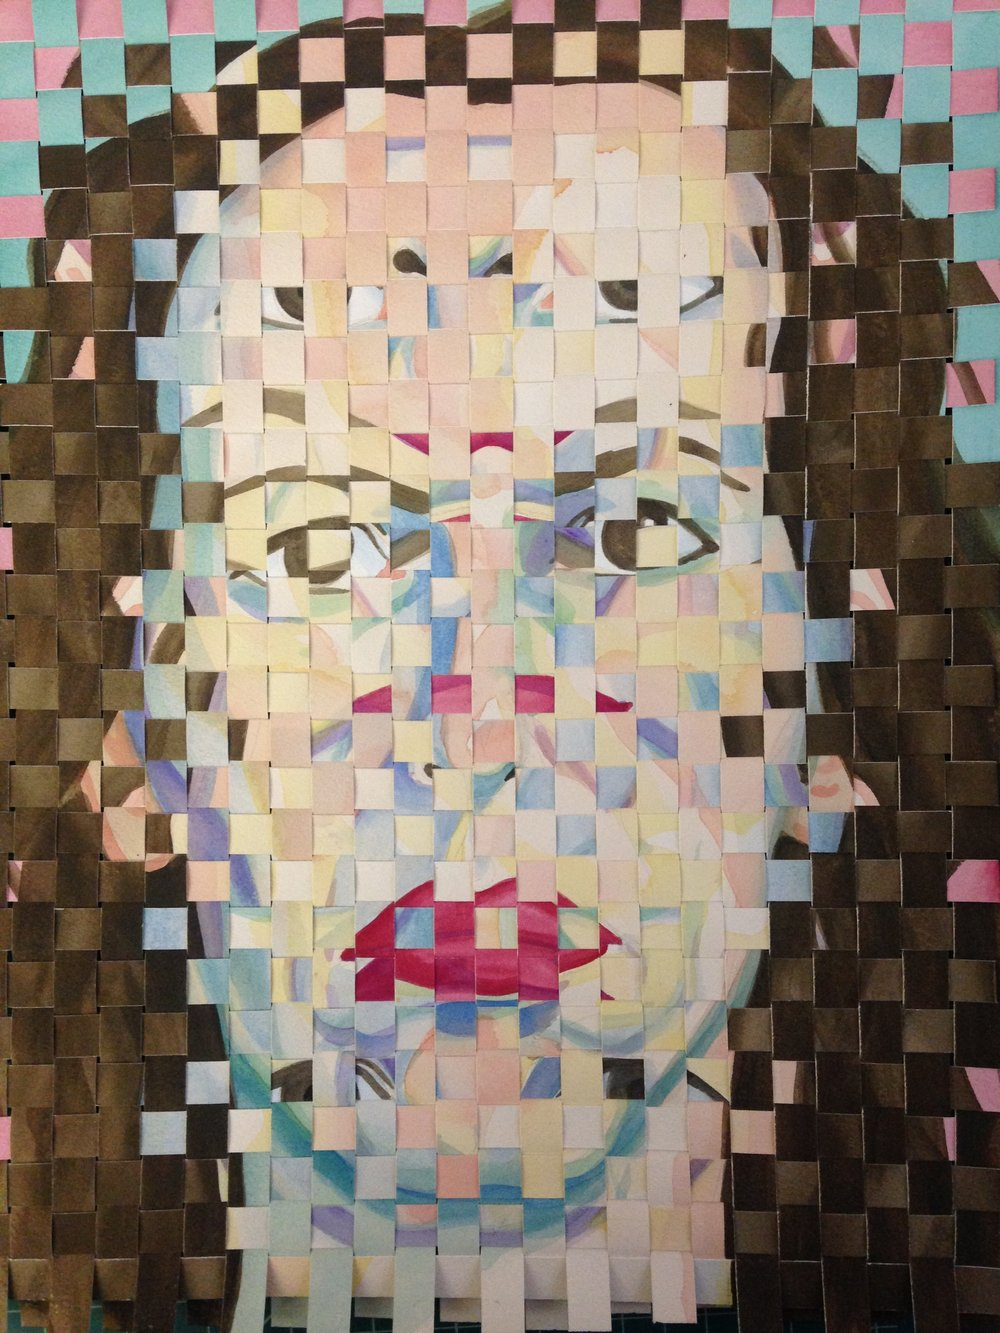 Woven Self-Portrait 030717